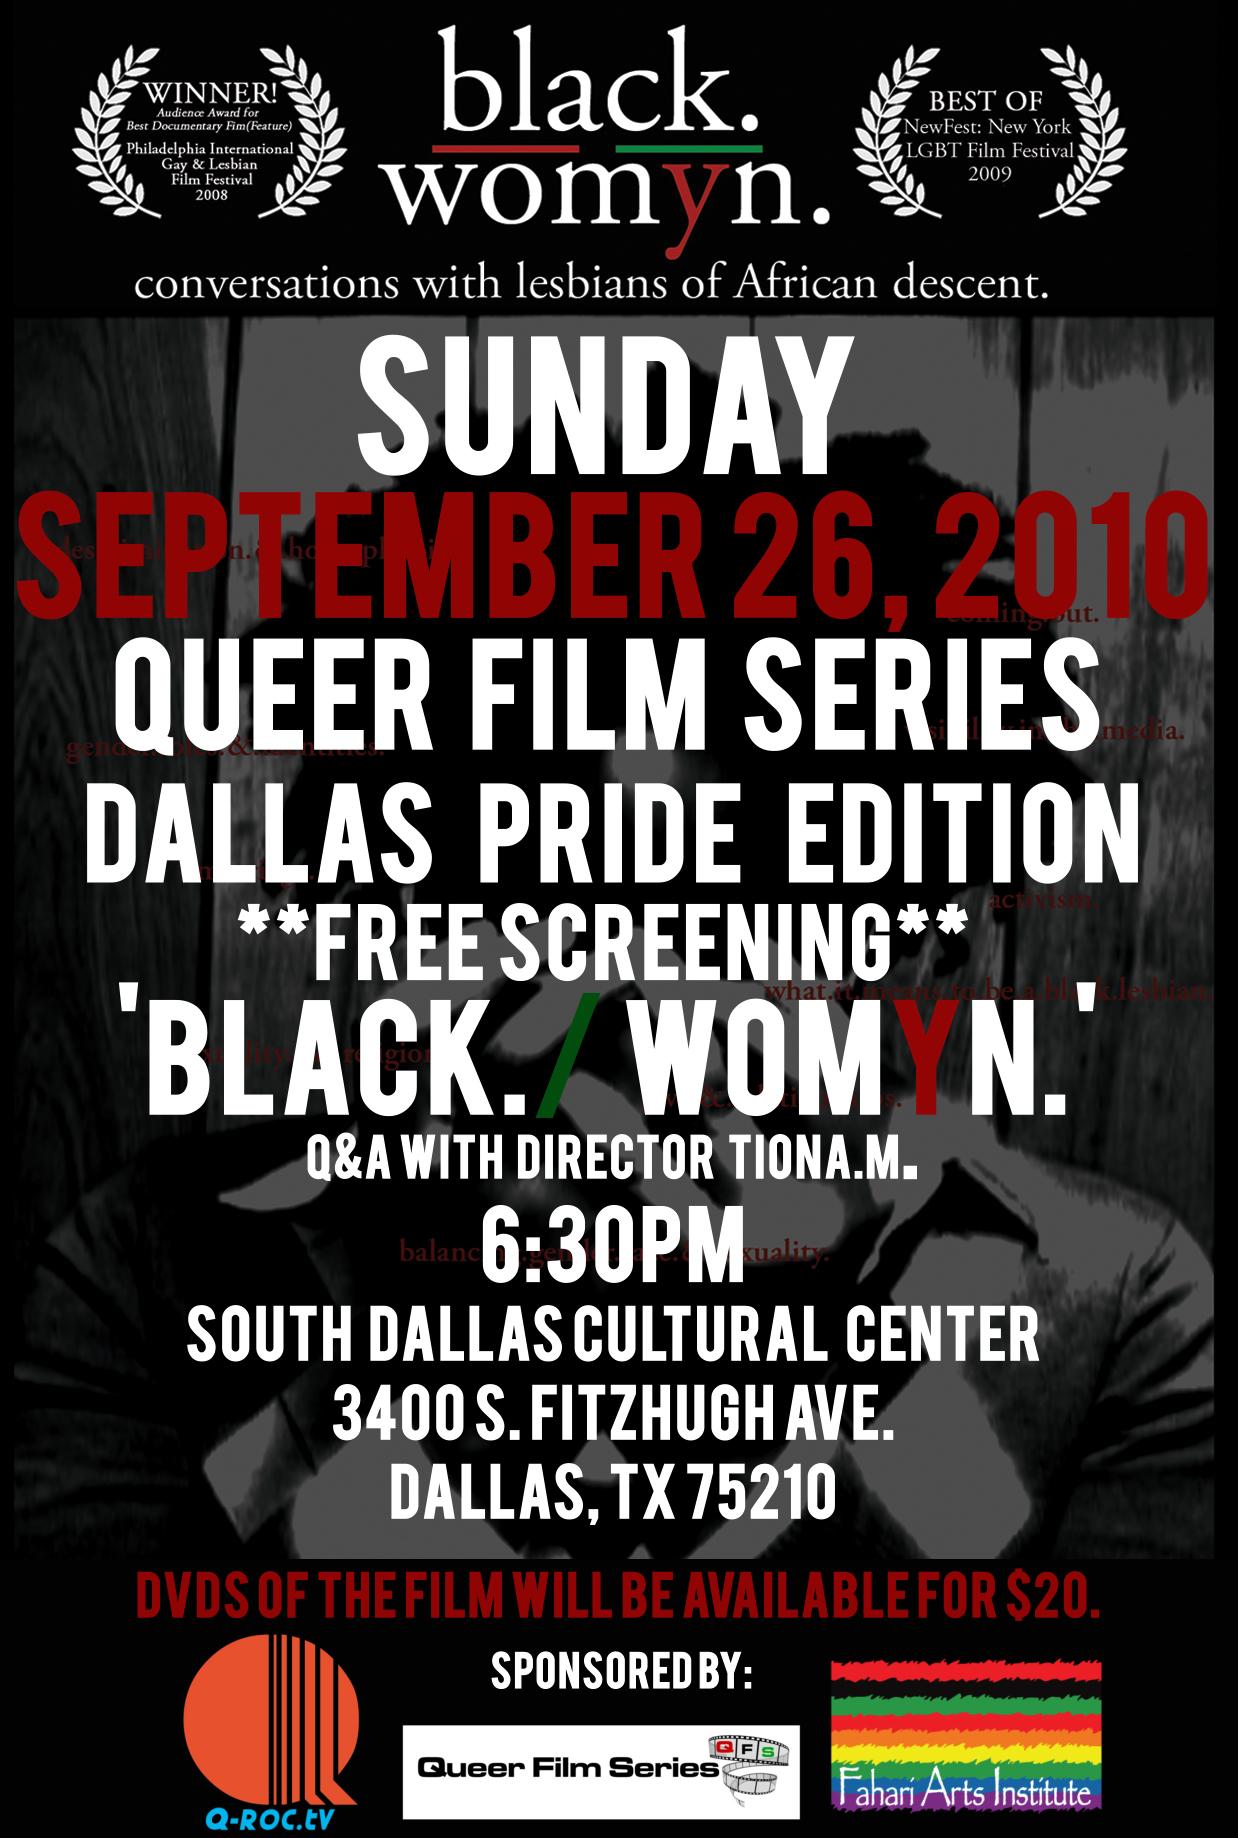 Dallas Black Lesbians - Black Lesbian Dating in Dallas